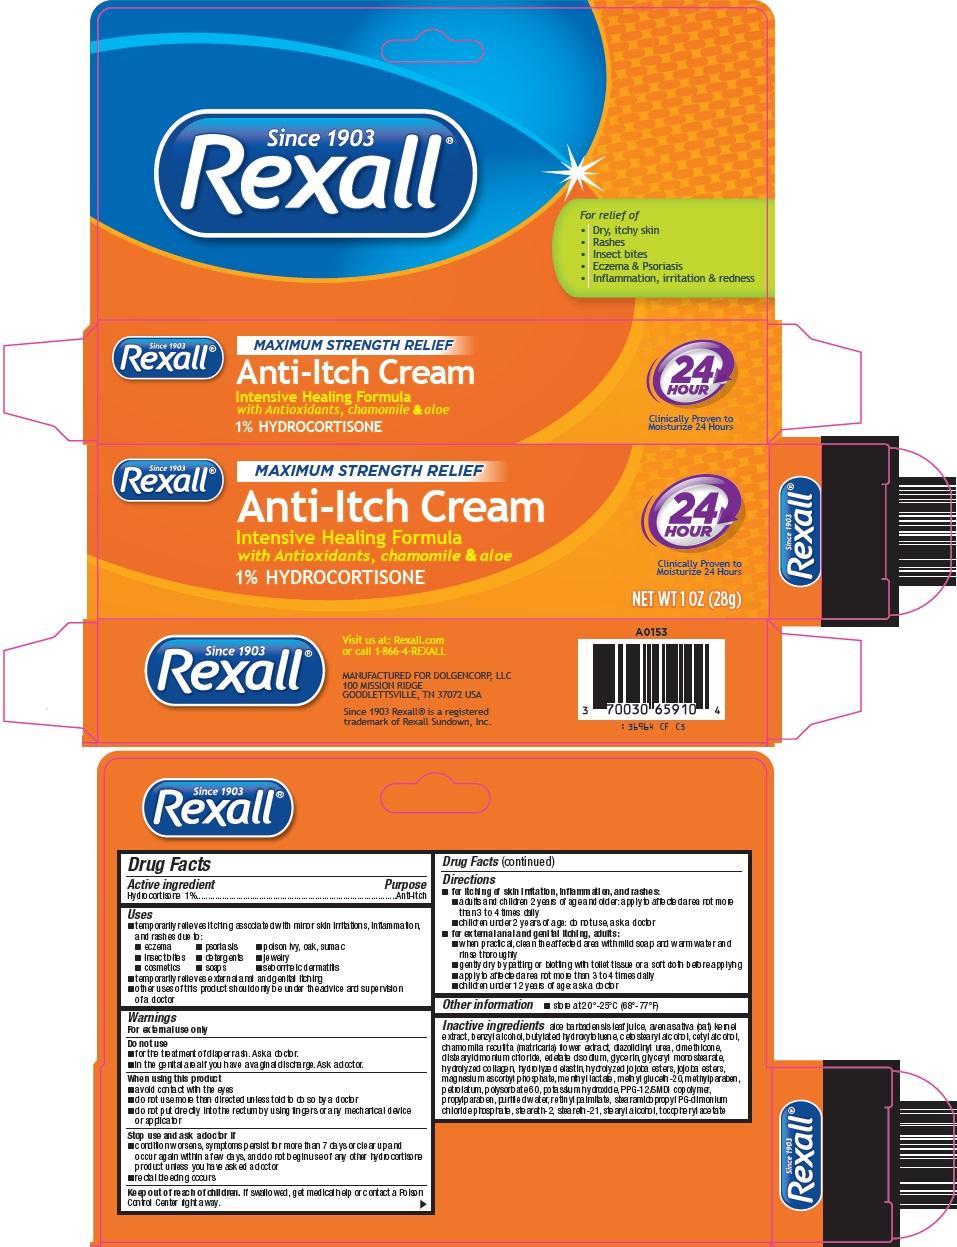 anti itch cream image